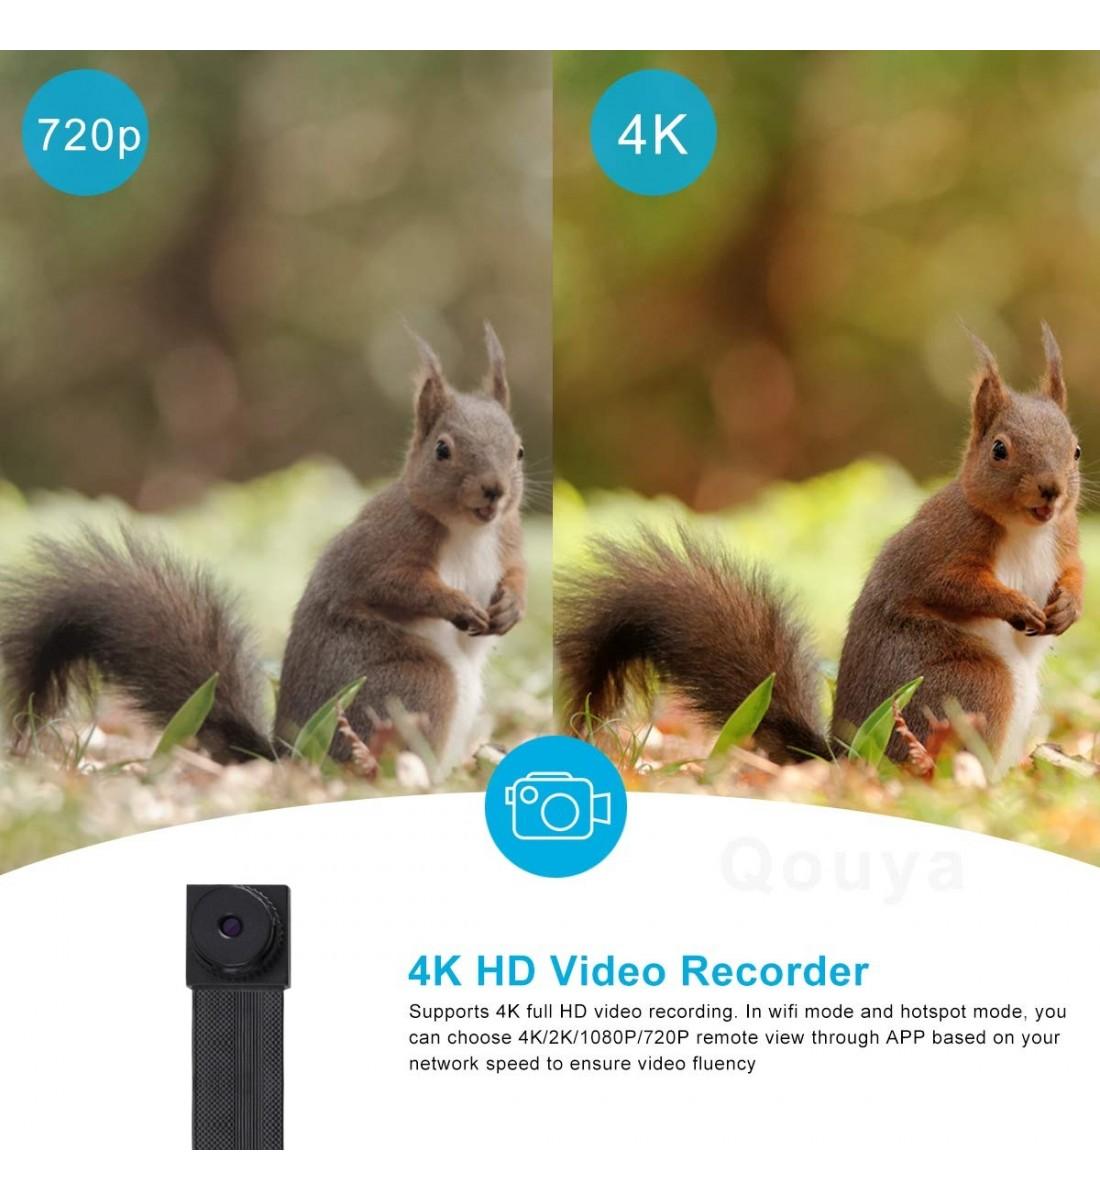 4K Ultra HD WiFi Hidden Spy Camera Mini Camera Wireless Motion Detection Nanny Cam Security System Video Camera Monitor Baby Office spy Cam App Camcorder Kid (5)